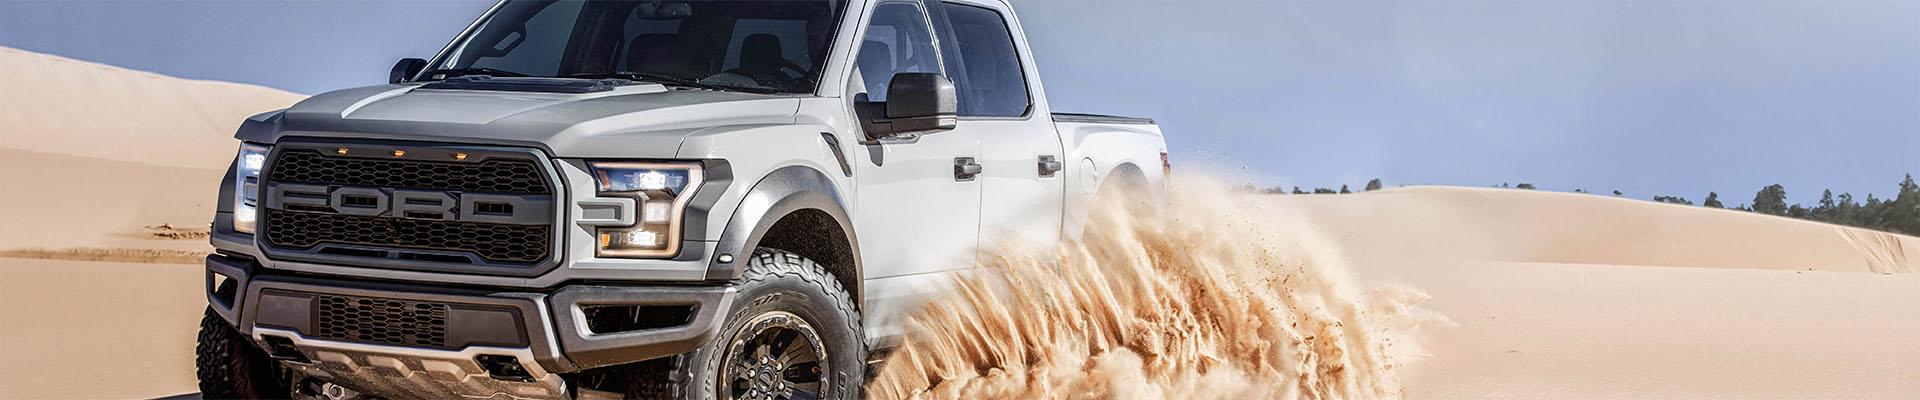 2017 Ford Raptor Eco Boost